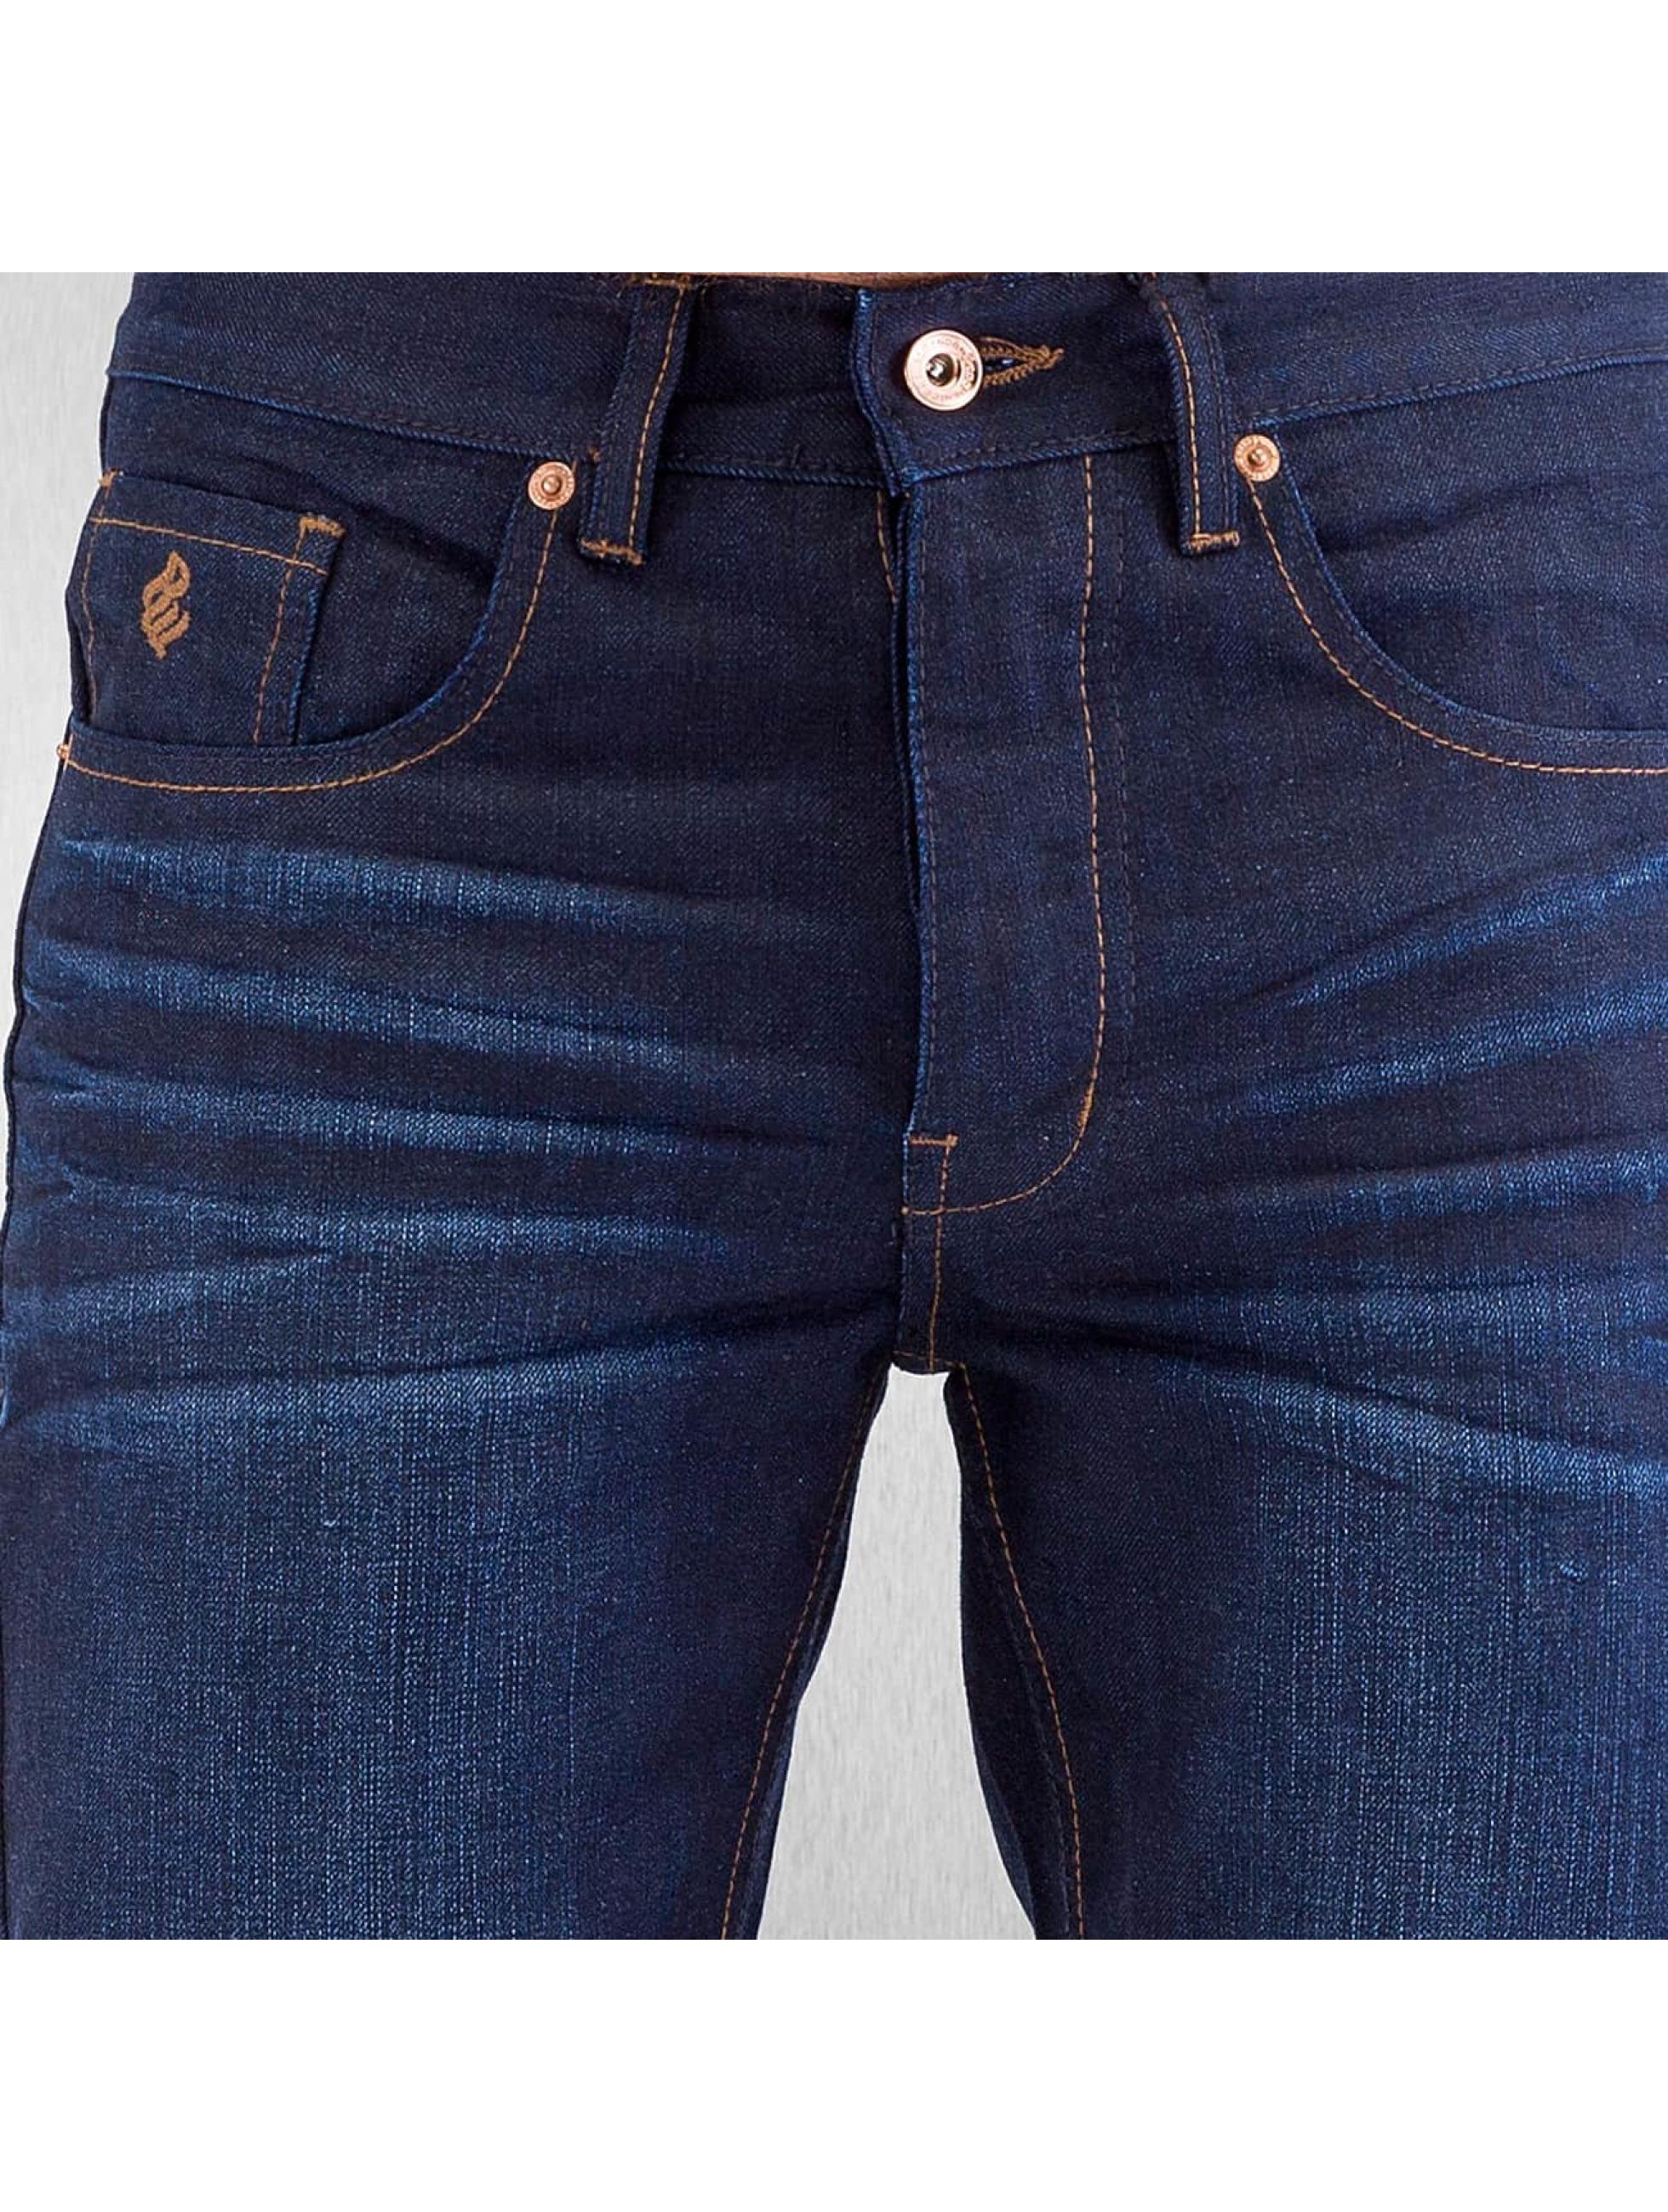 Rocawear Dżinsy straight fit Relaxed niebieski